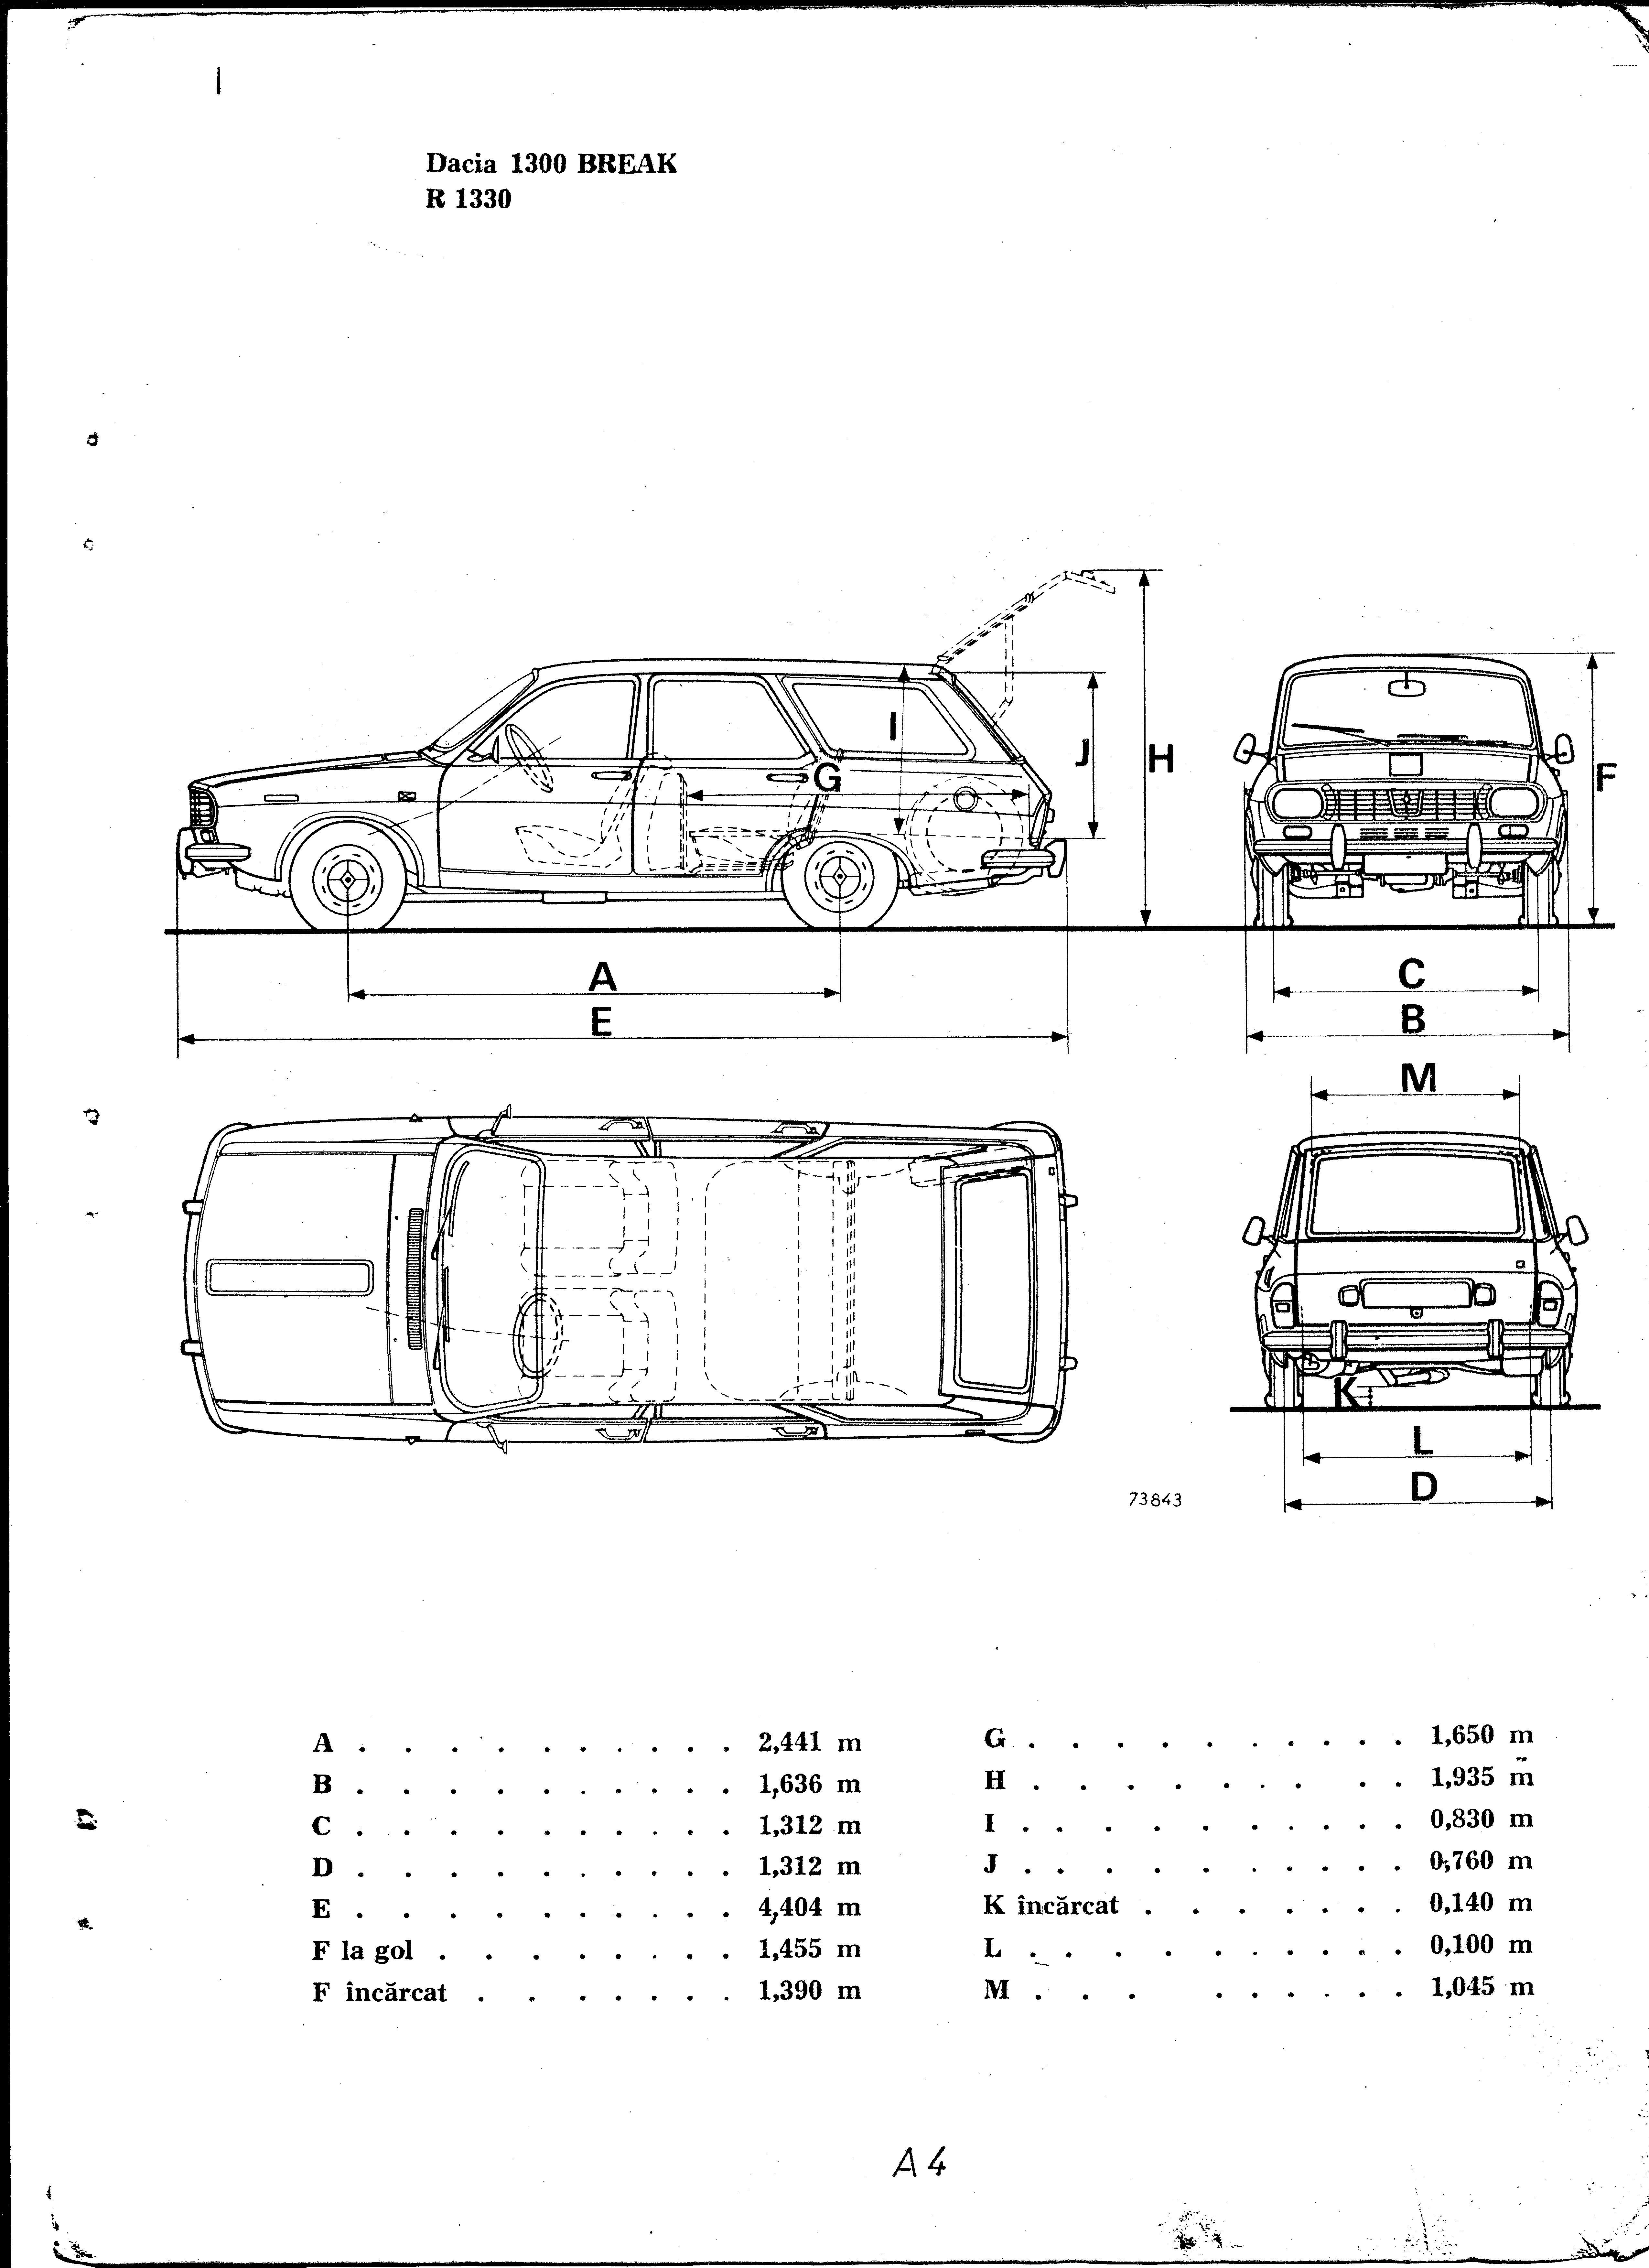 A 4.jpg